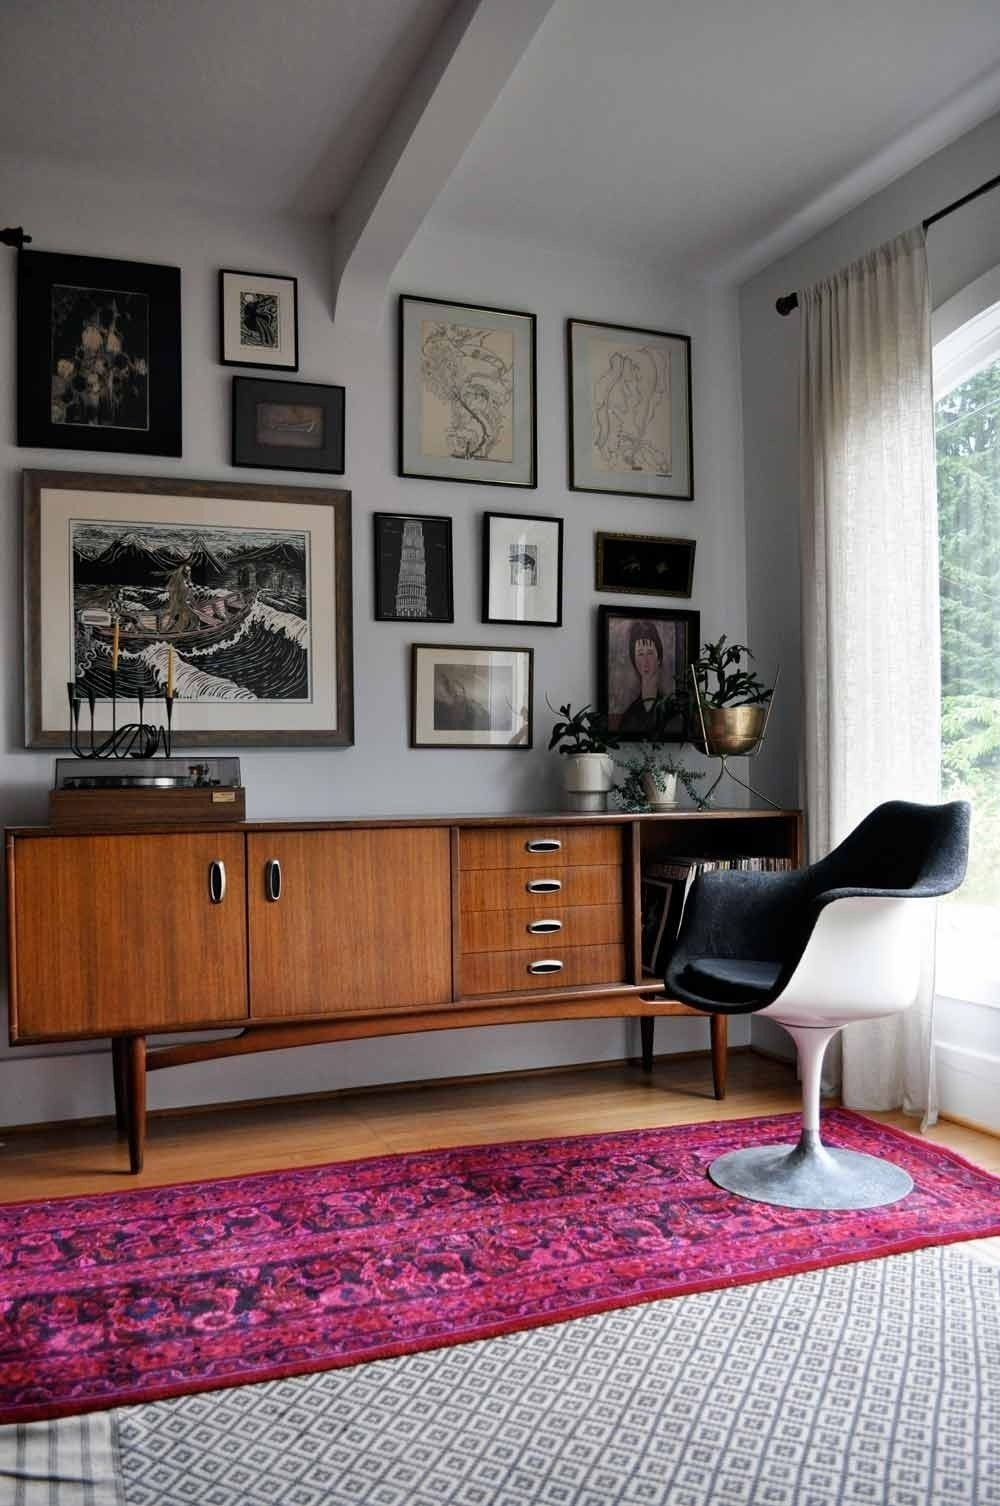 Updated Style: Mid Century Modern | Mid Century Modern Design, Mid Within Mid Century Wall Art (View 19 of 20)